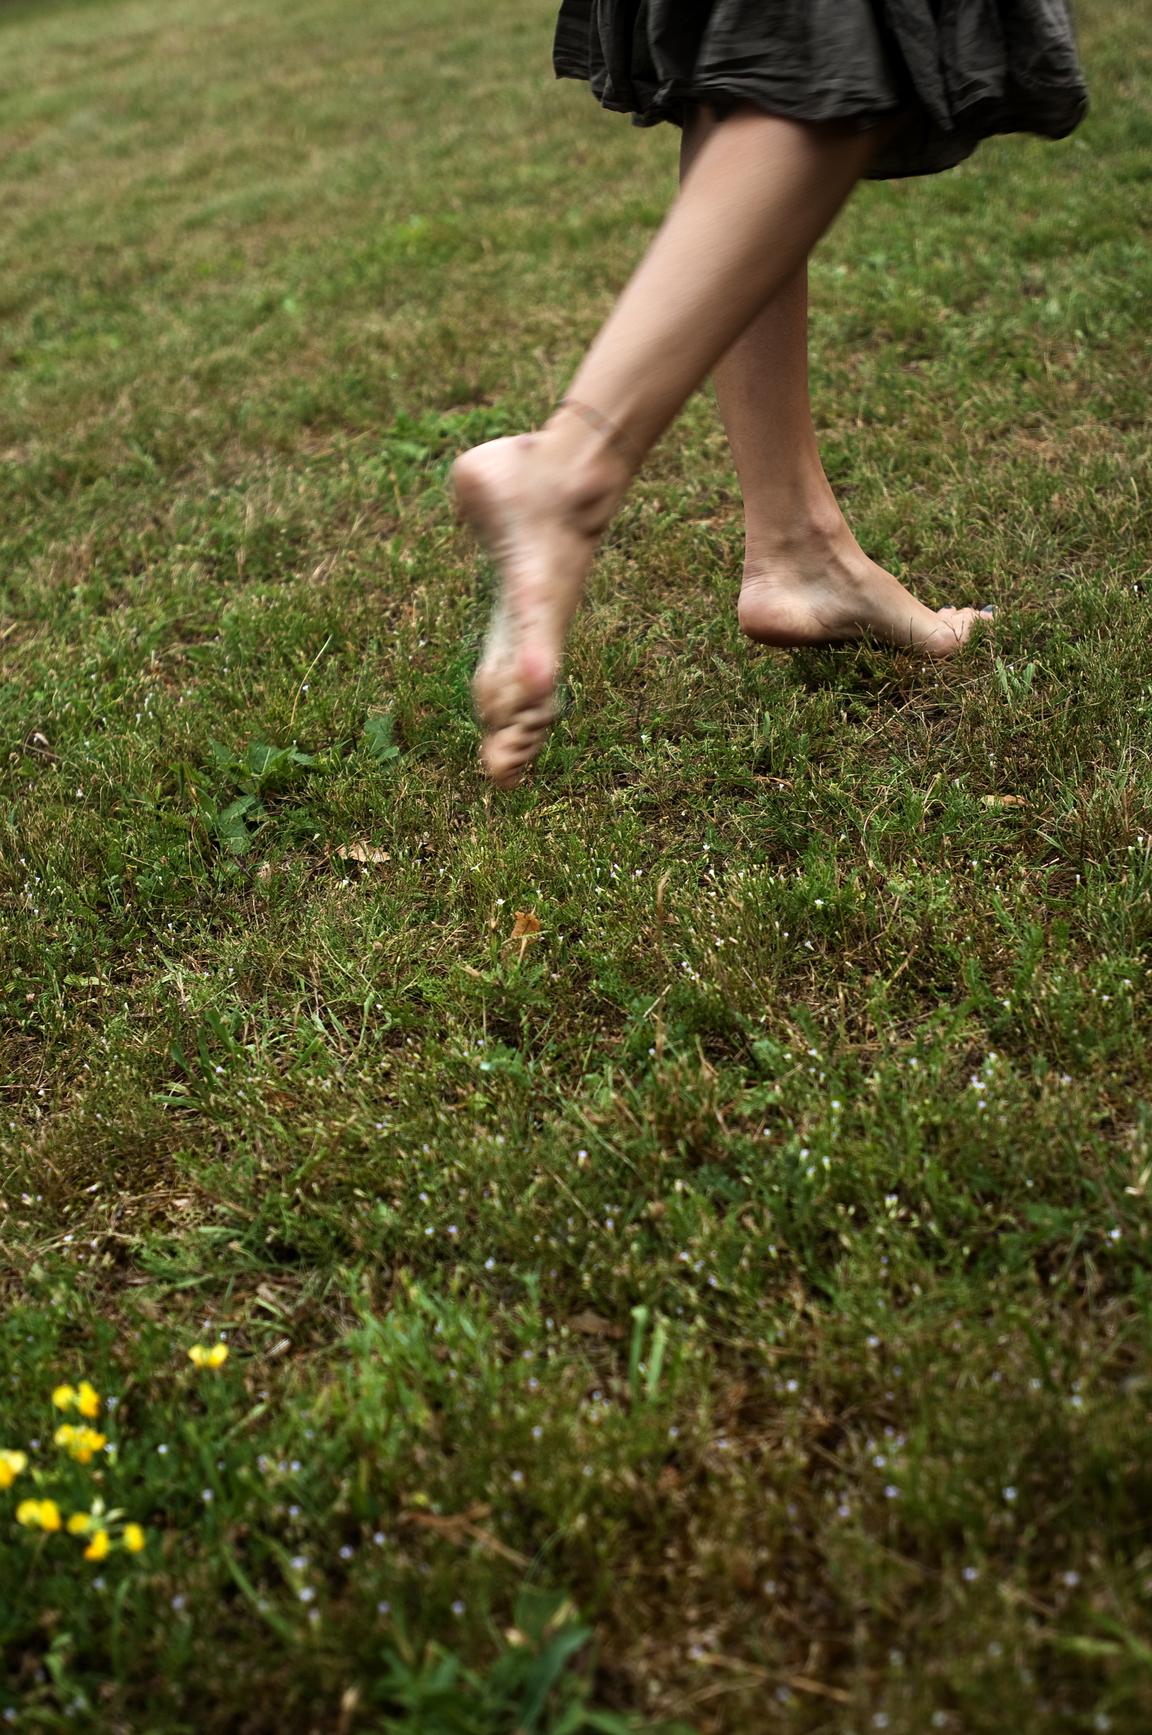 woman walking in grass - photo #27